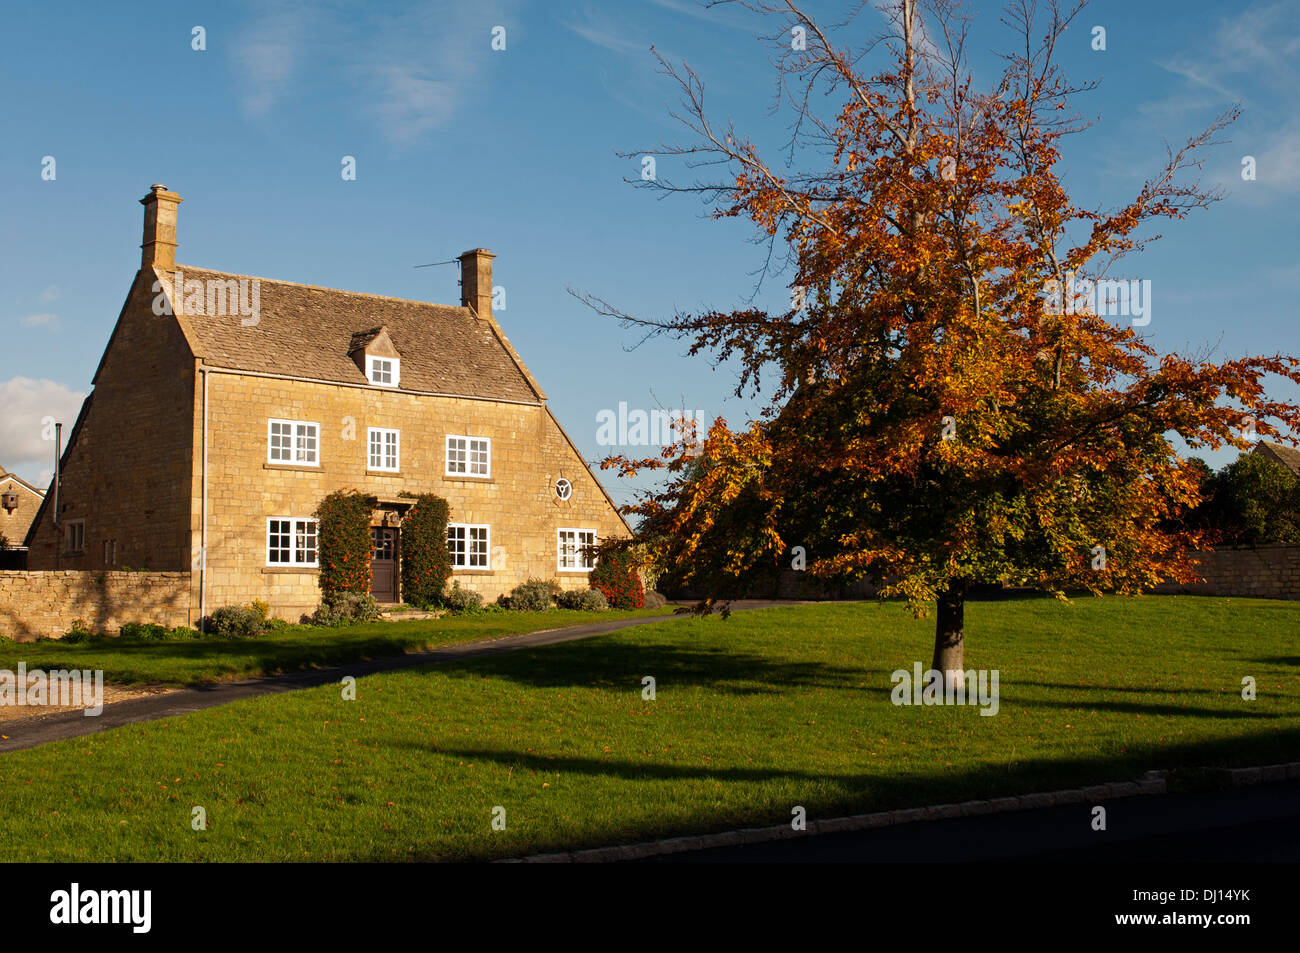 Willersey village in autumn, Gloucestershire, England, UK Stock Photo